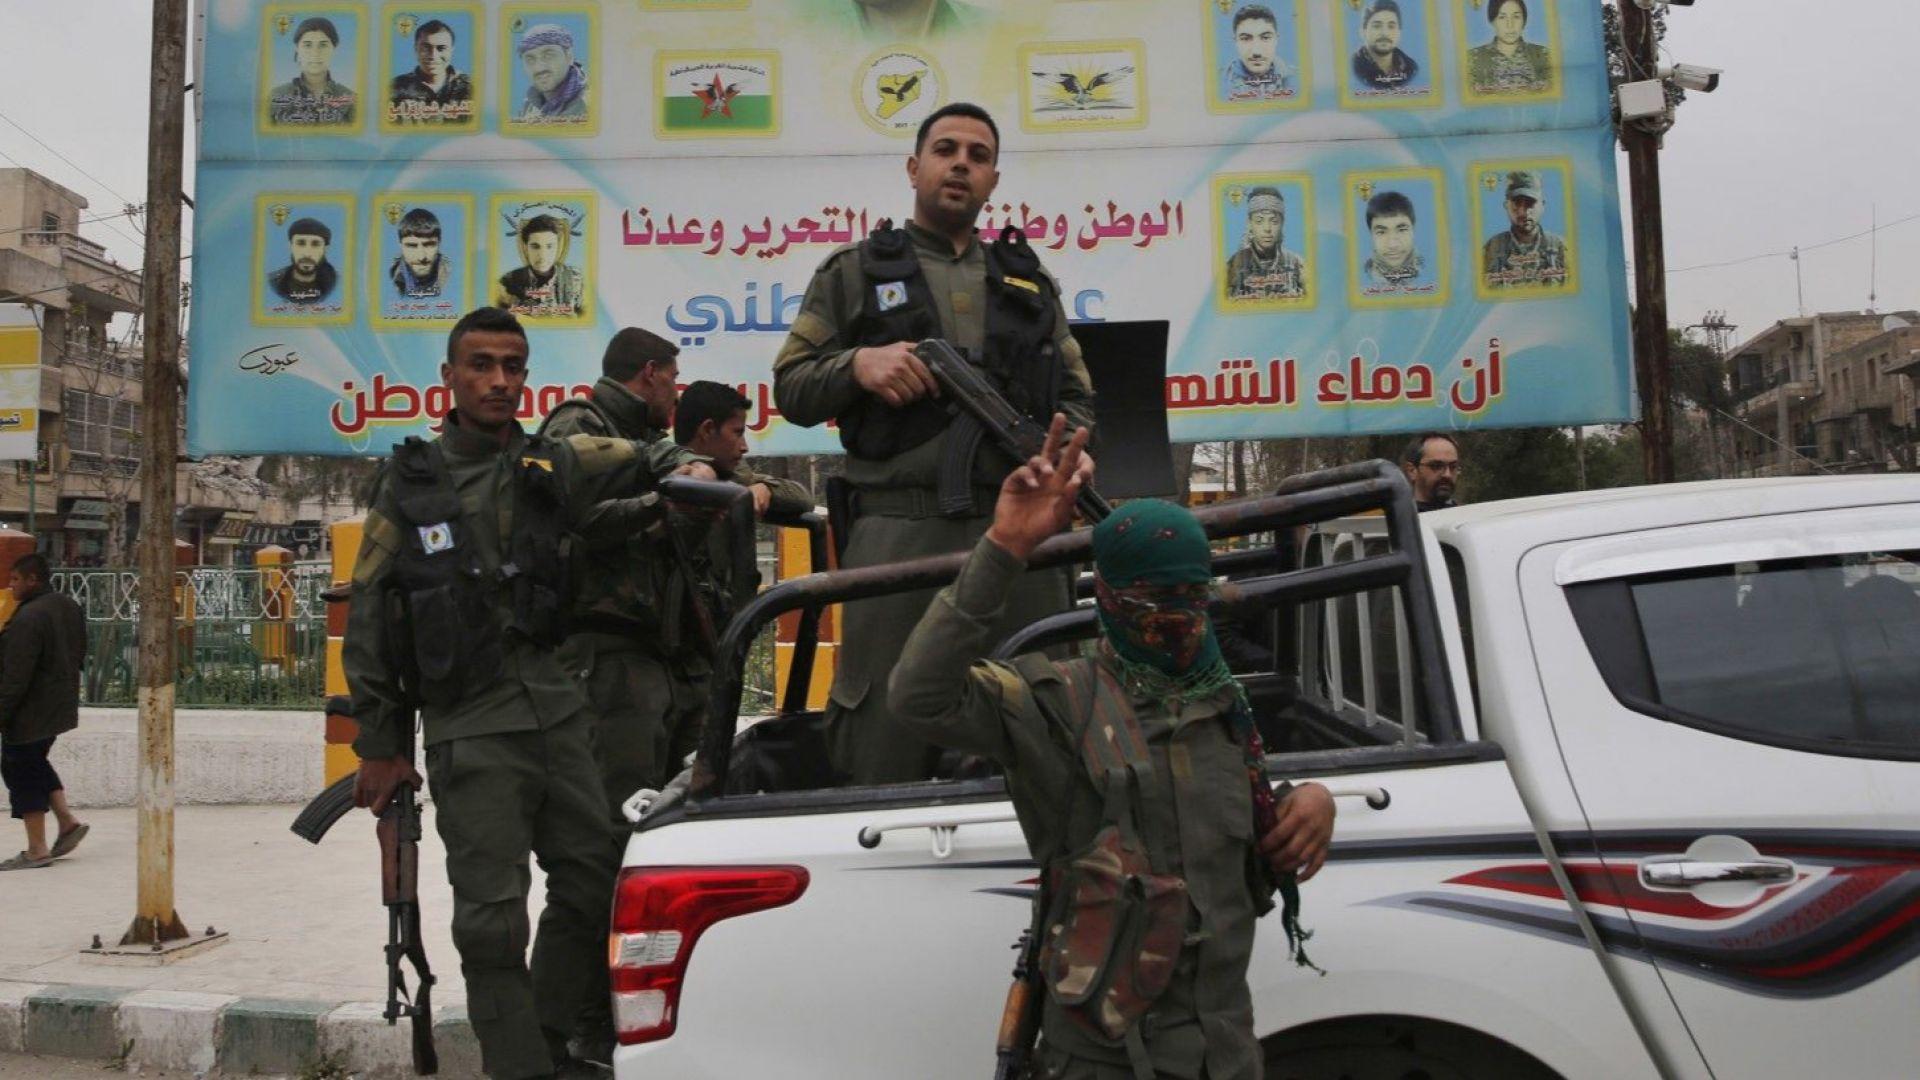 400 кюрдски бойци напуснаха Манбидж, обяви сирийската армия